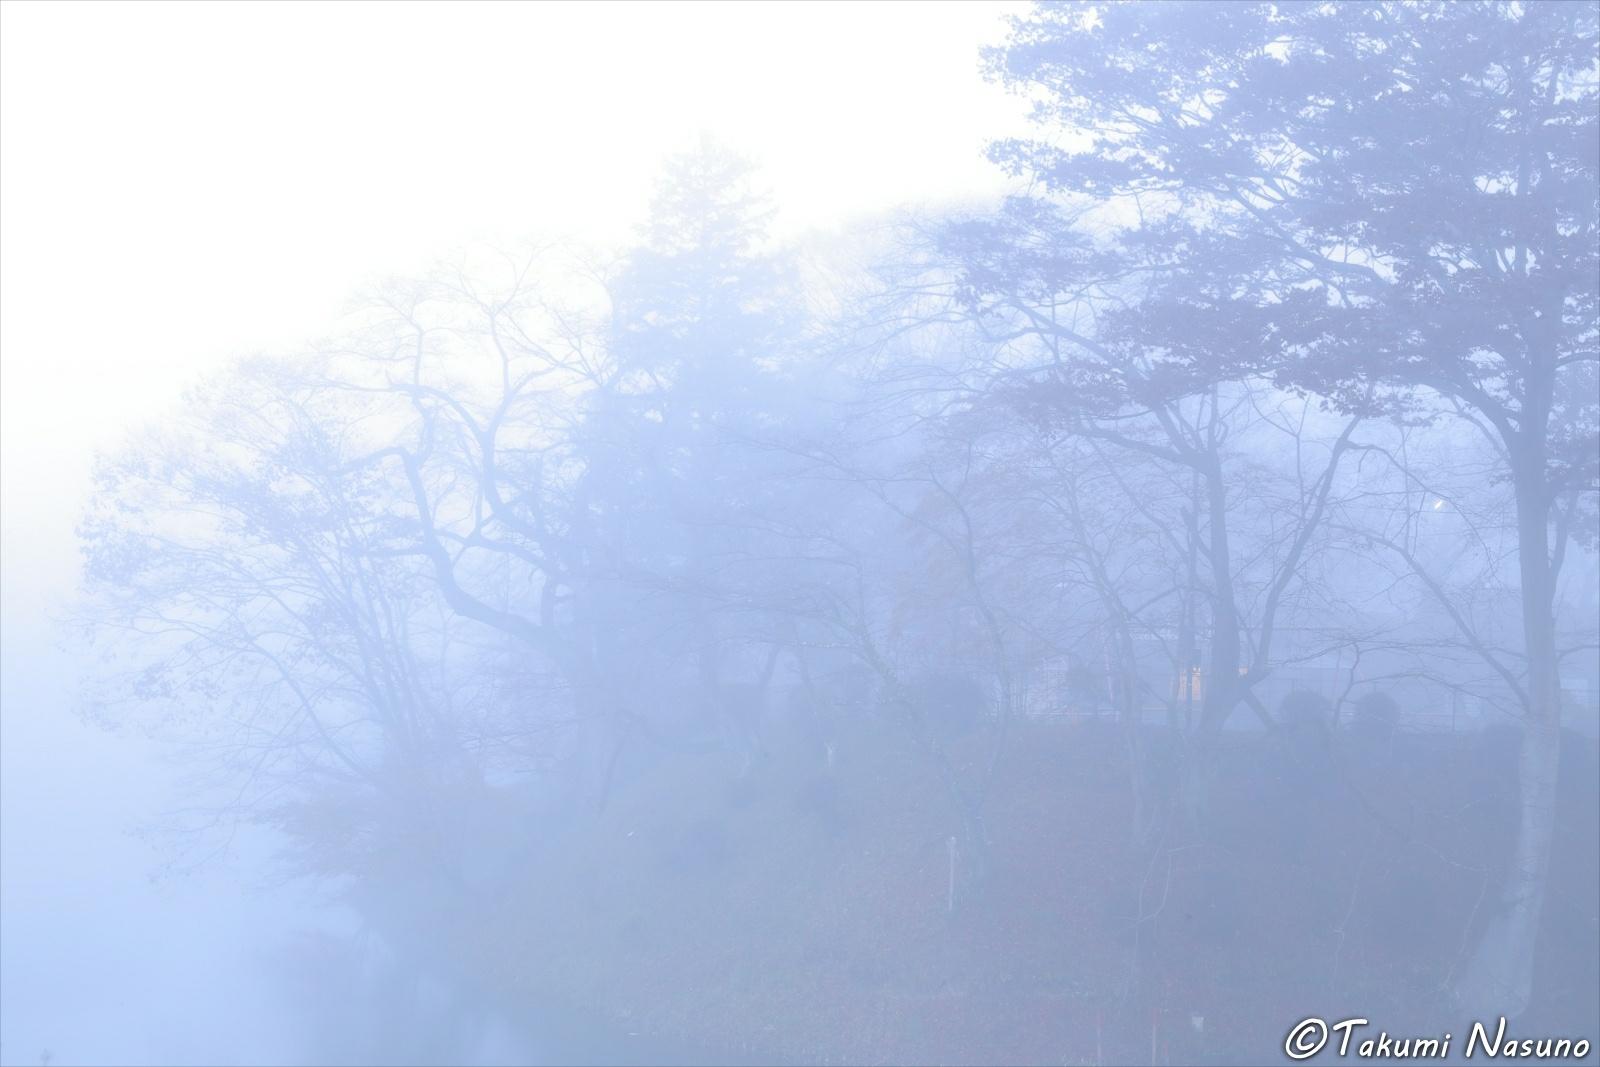 Site of Tanagura Castle in the Mist